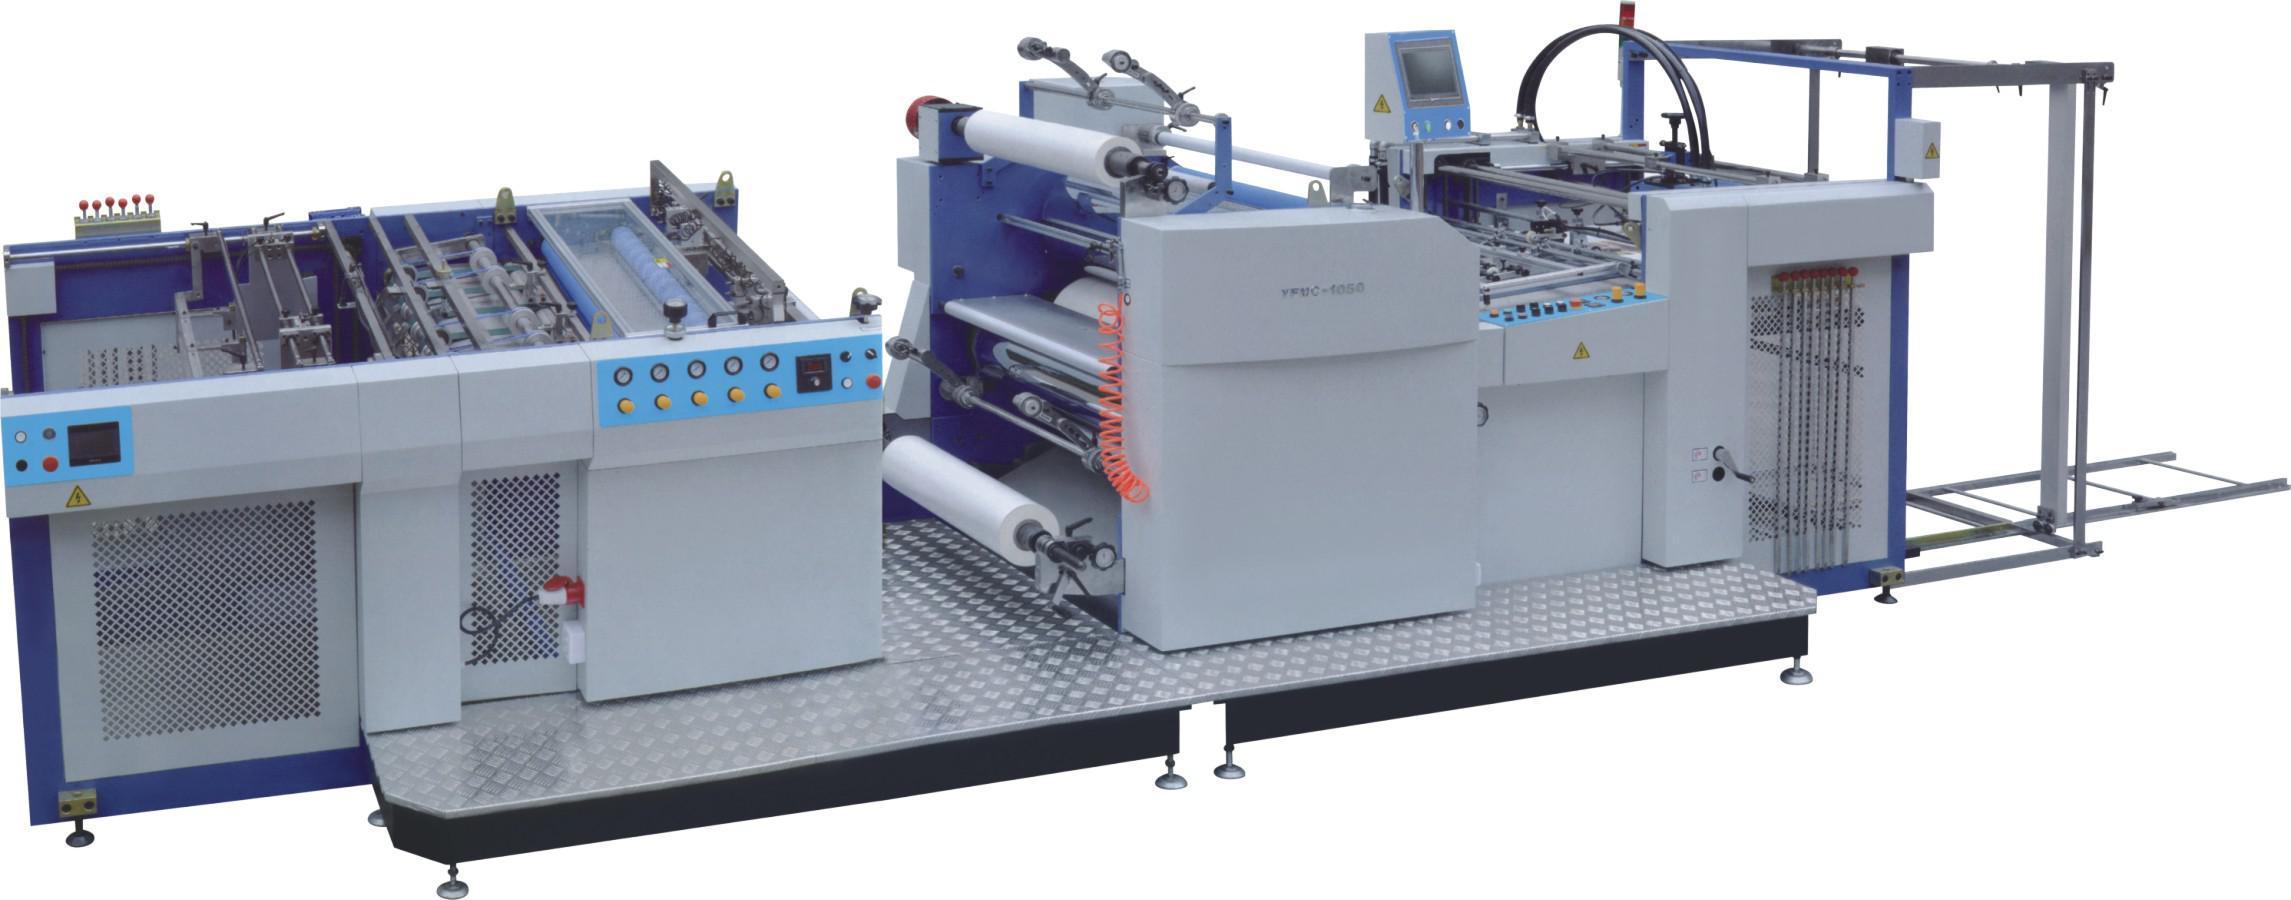 Automatic High Speed Dry Laminating Machine (SAFM-920B)